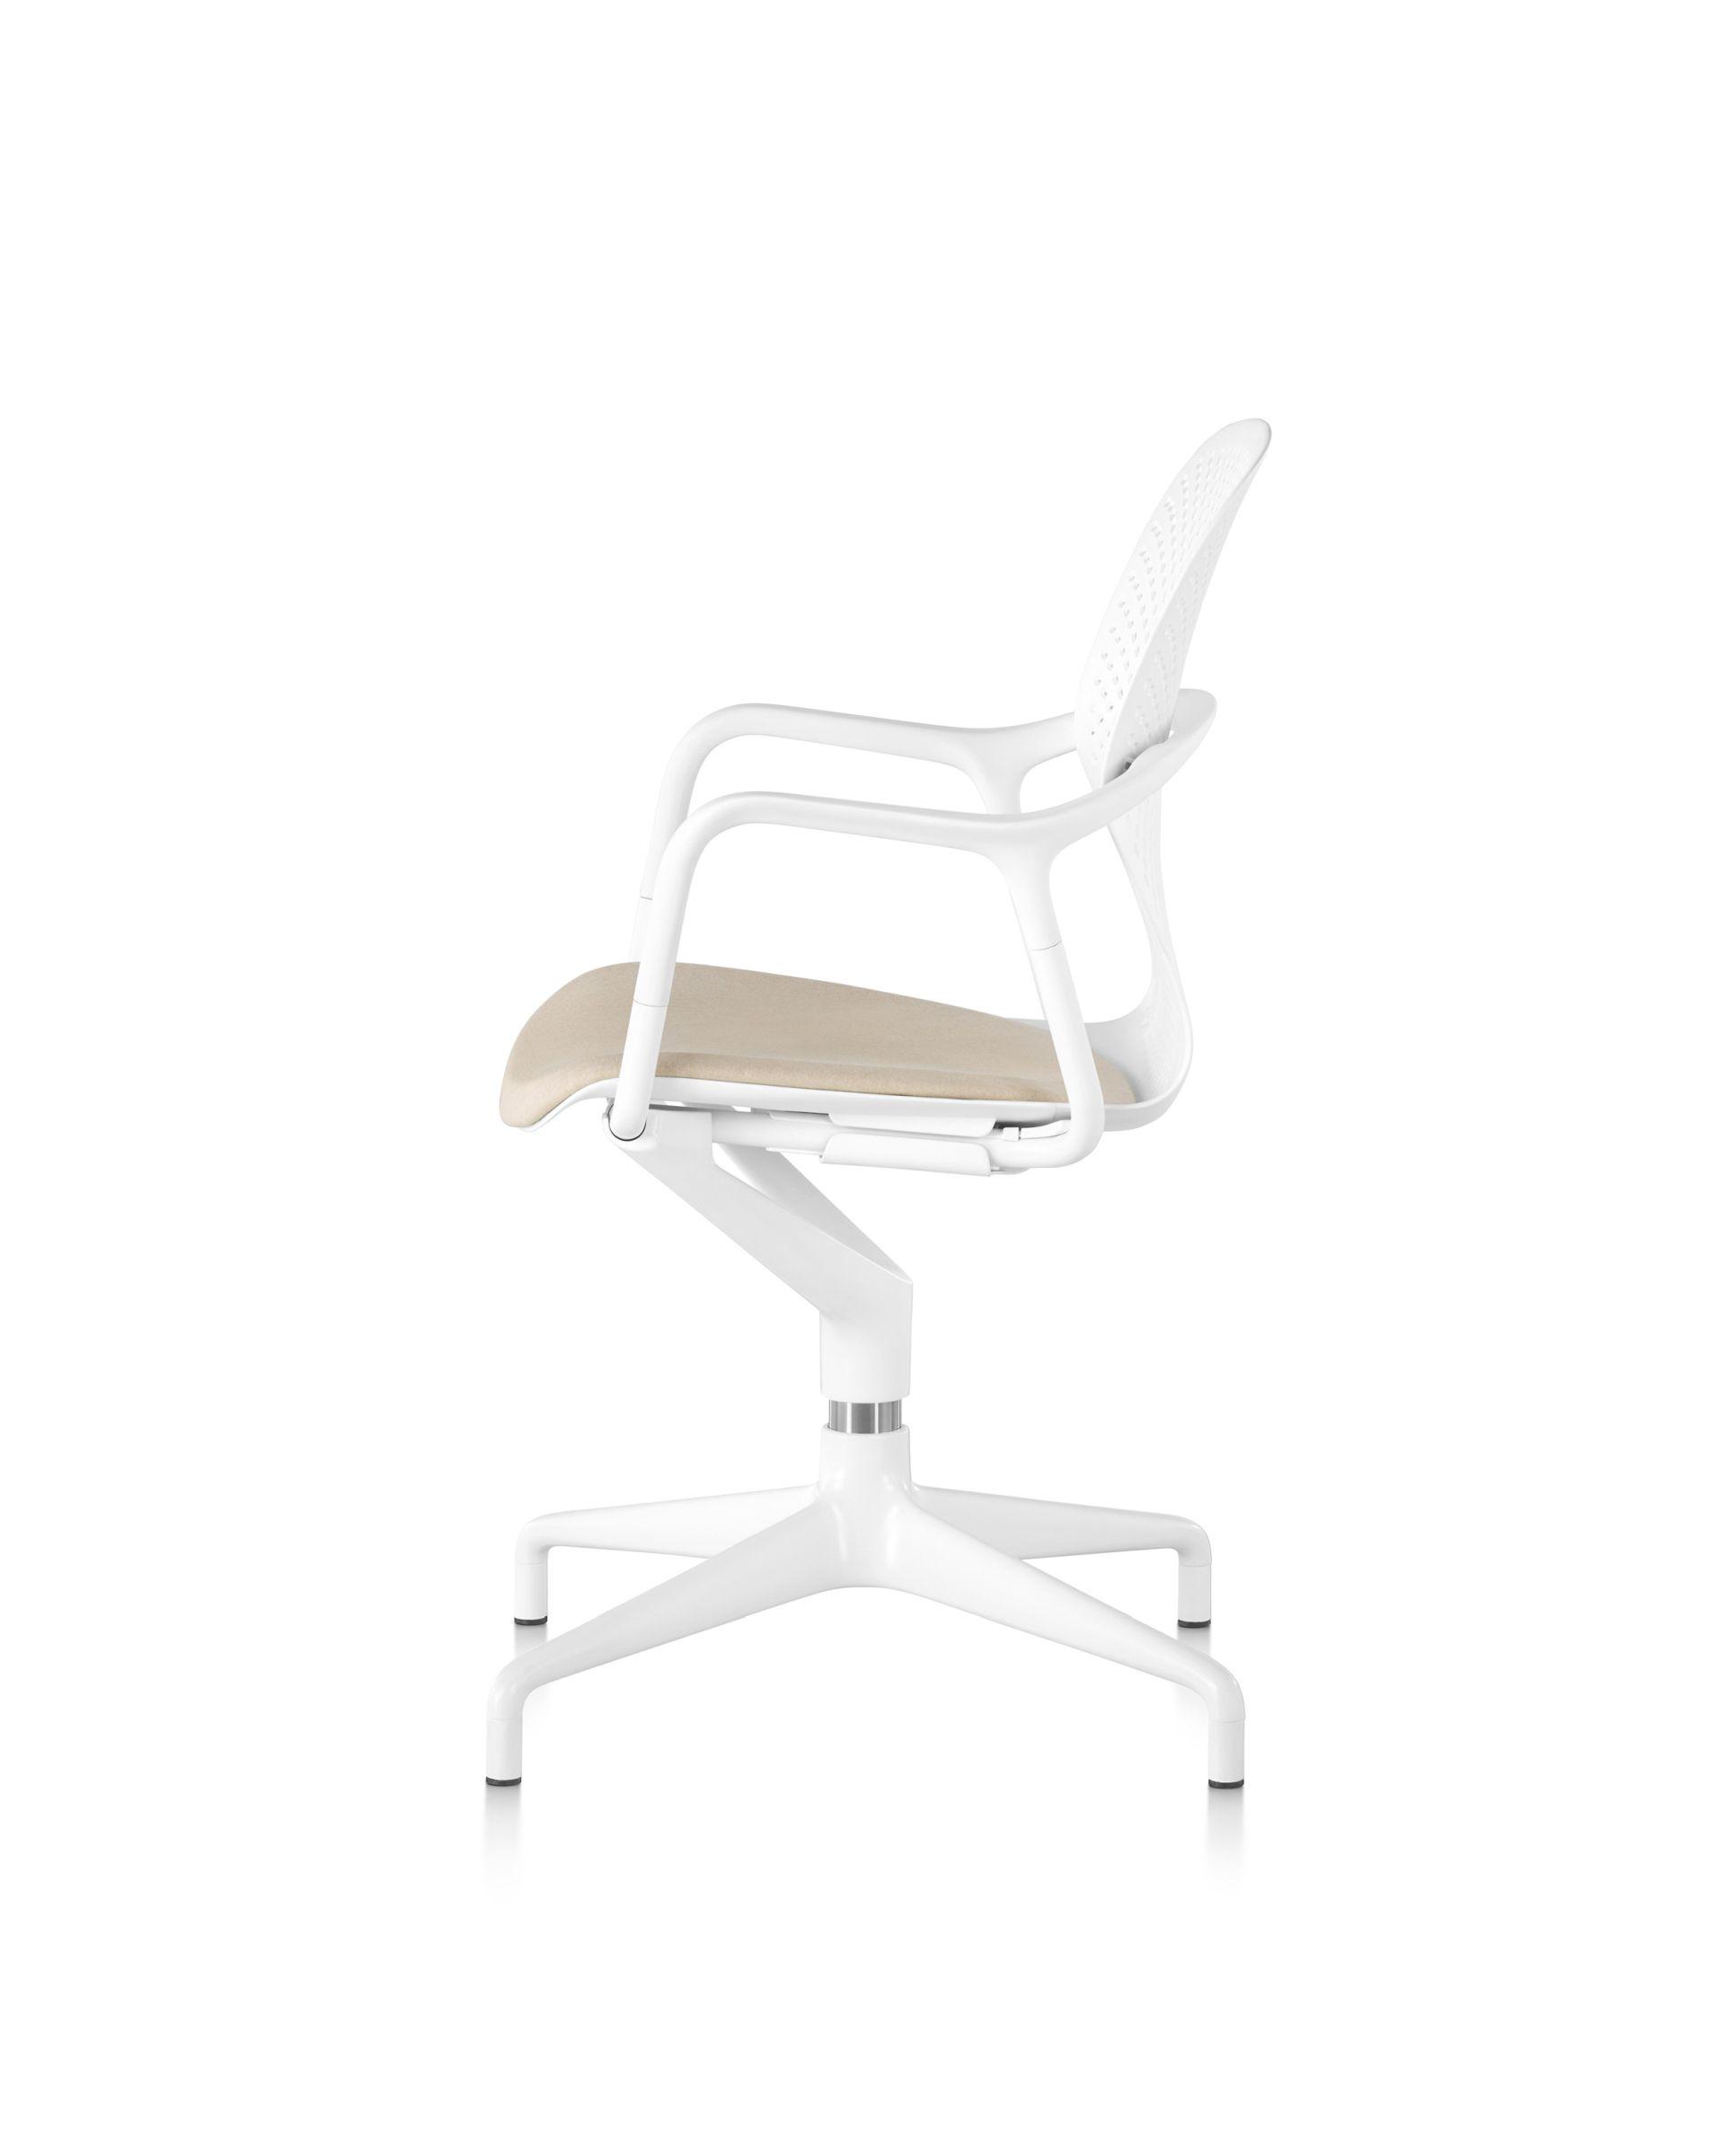 chair design love bungee computer keyn that